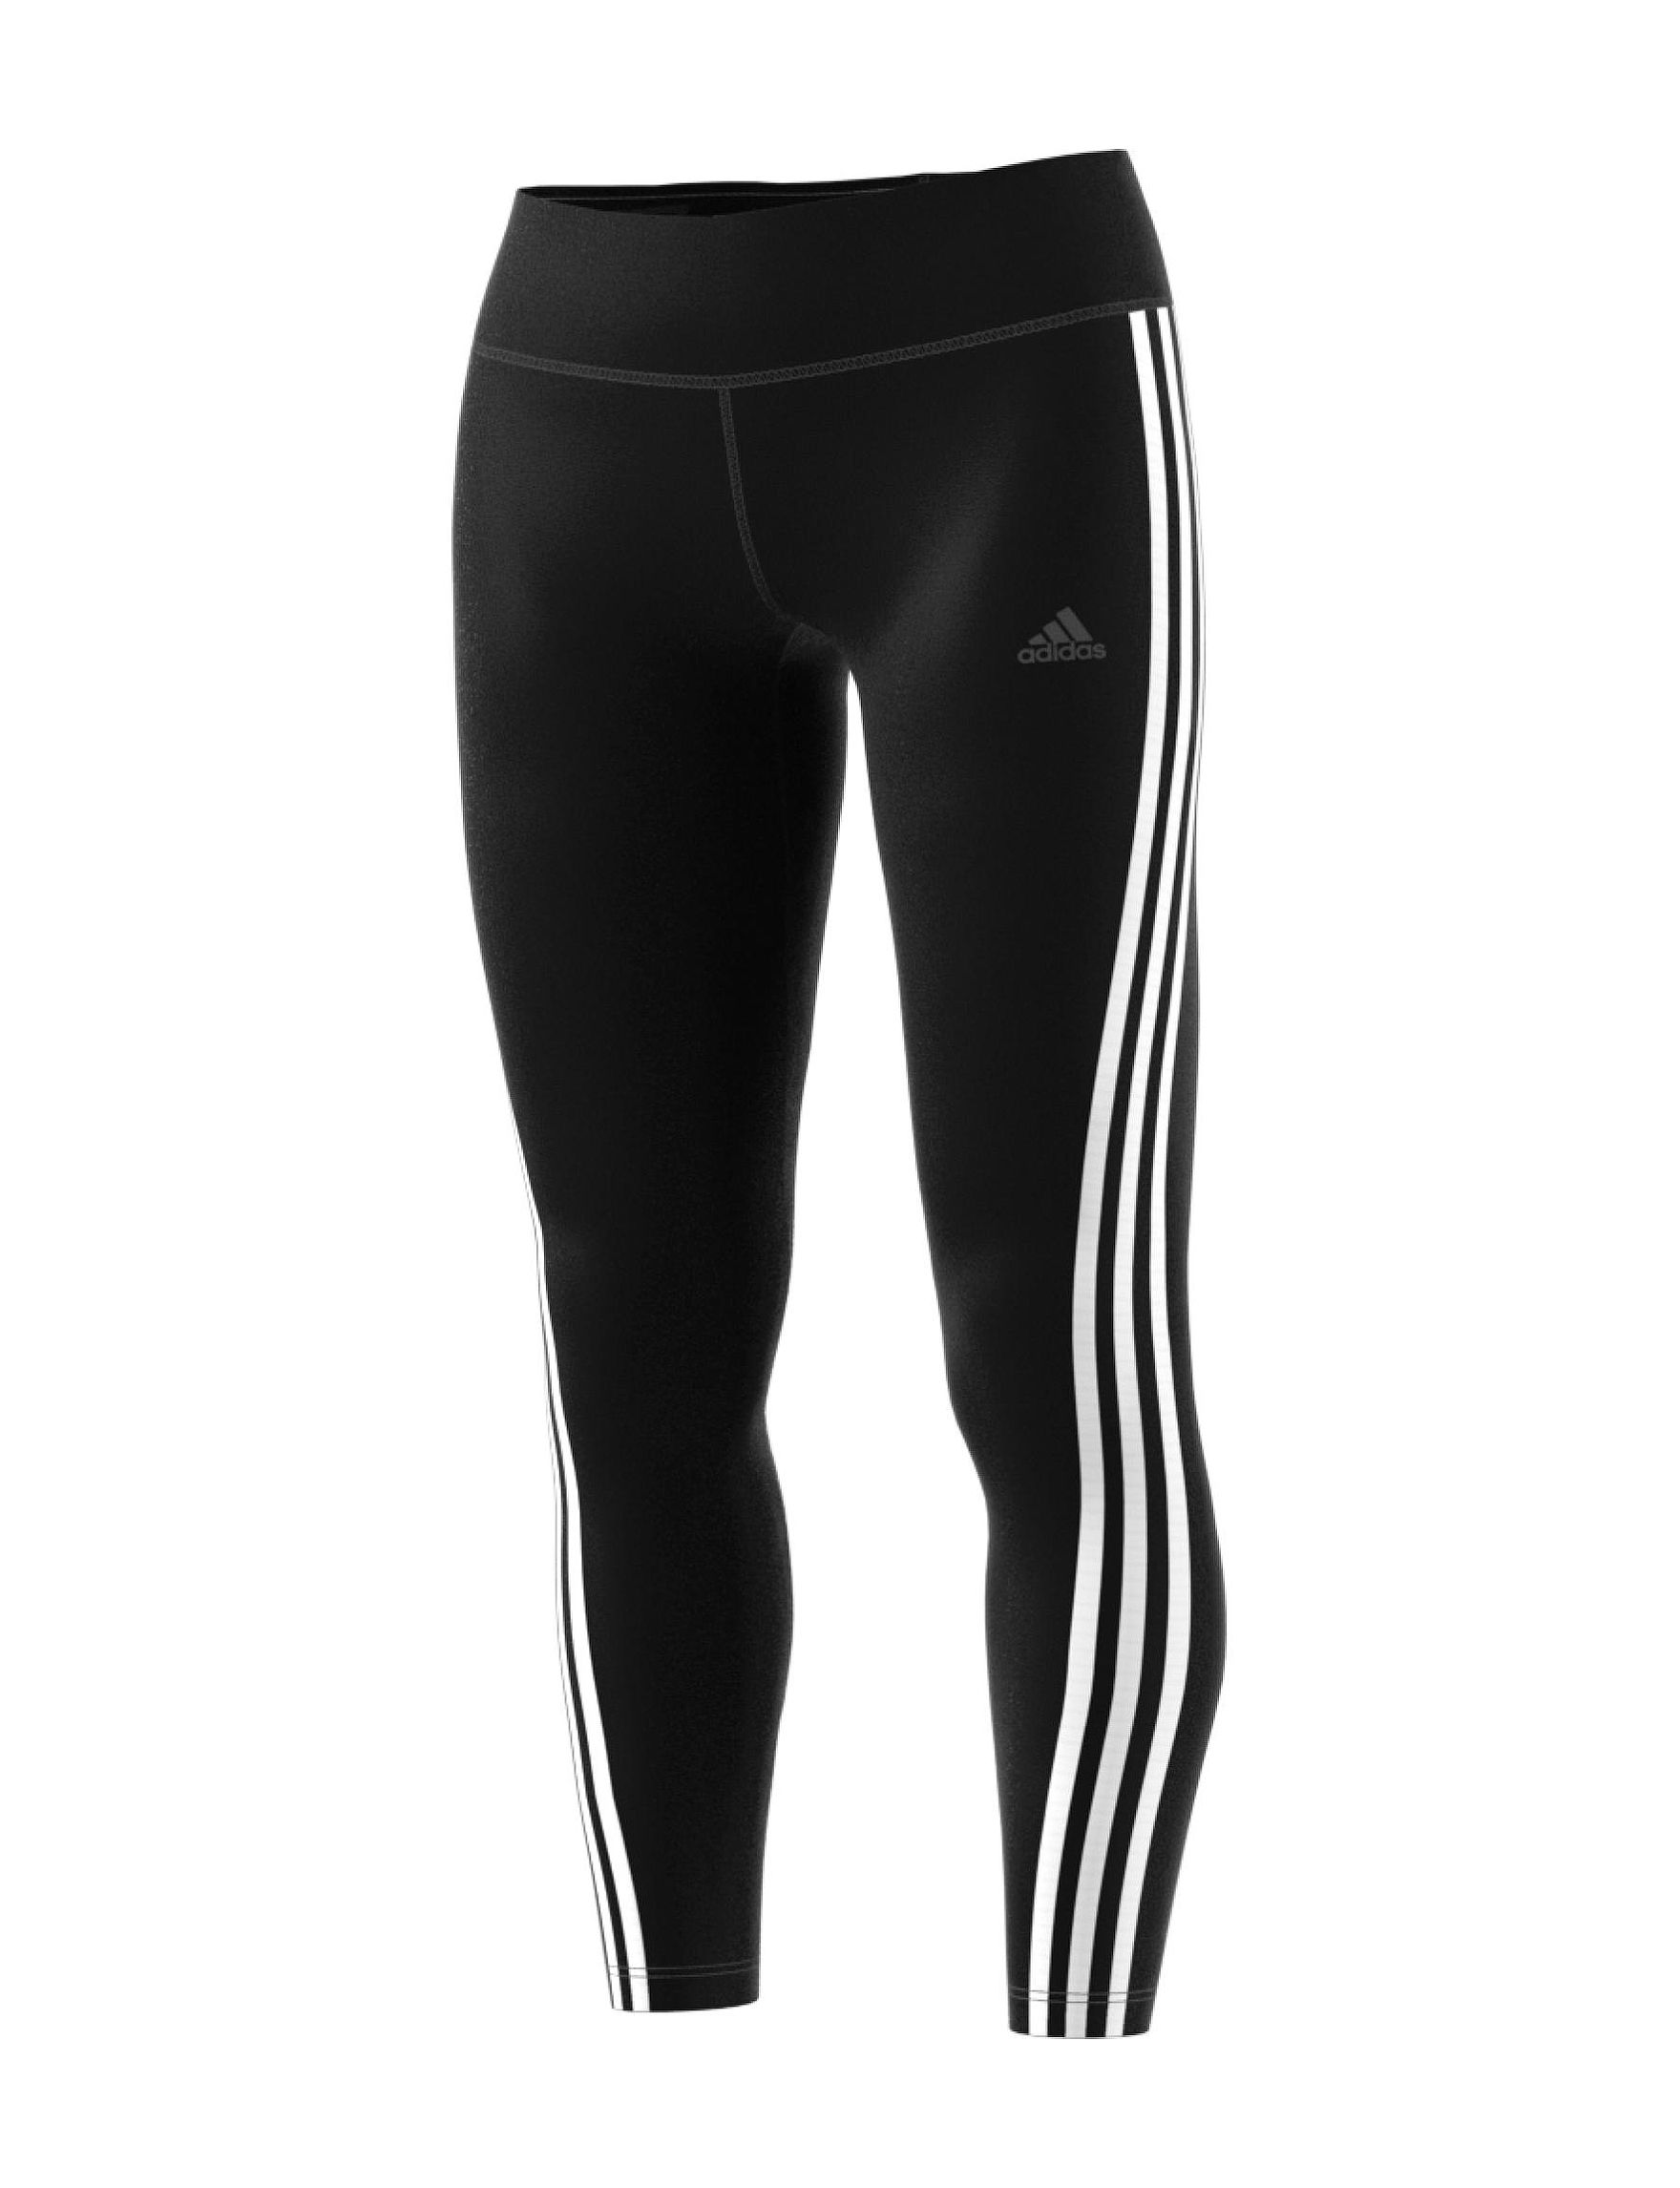 Adidas Black / White Leggings